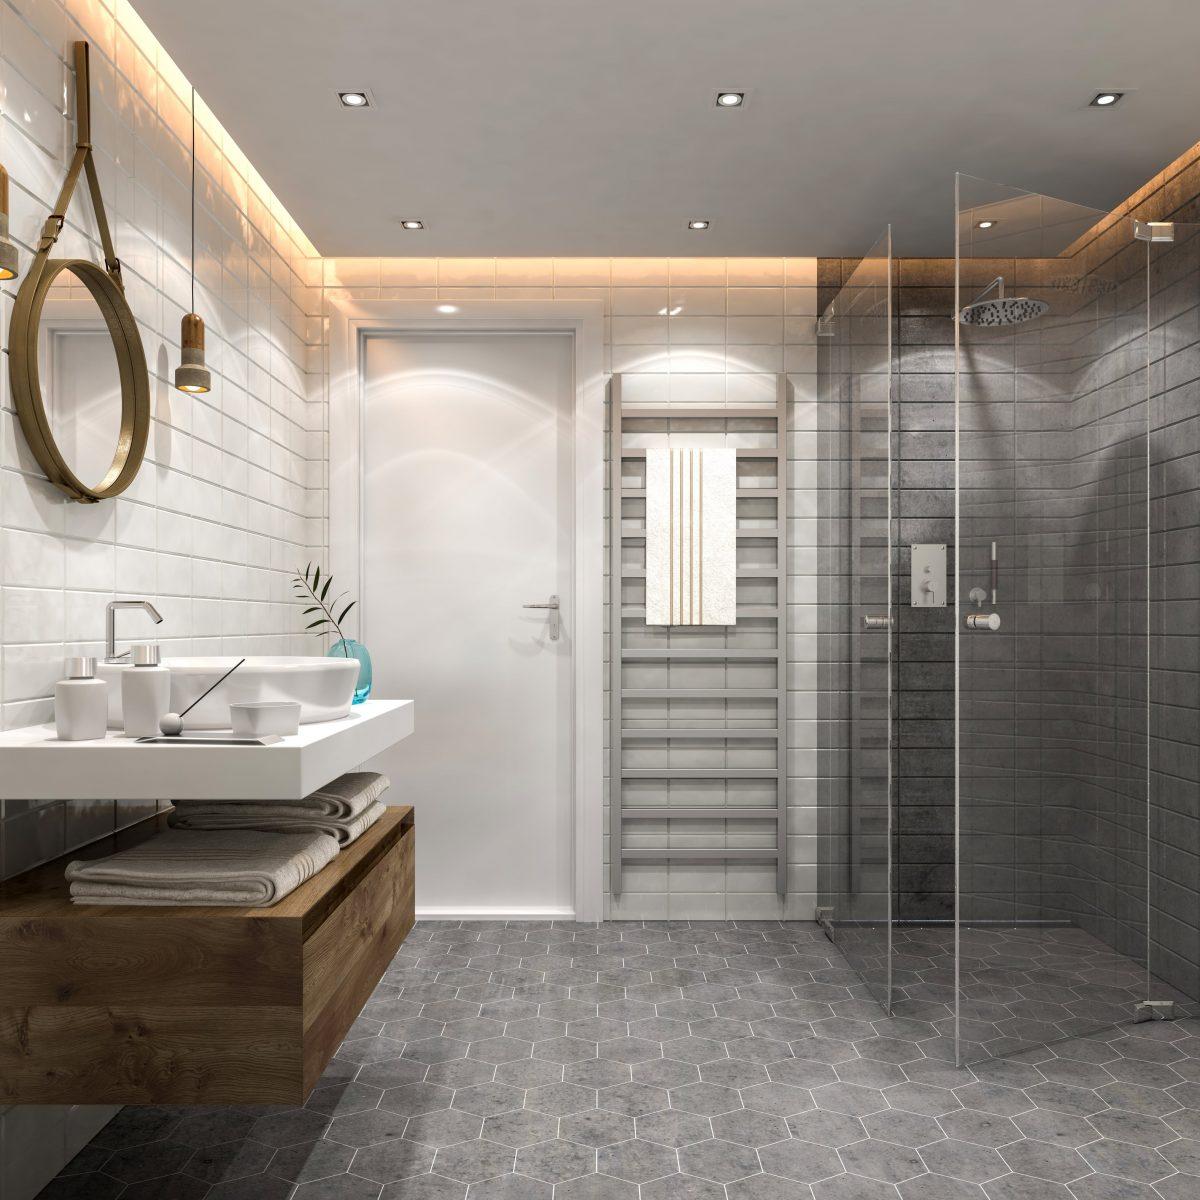 Installation d'une douche a l'italienne